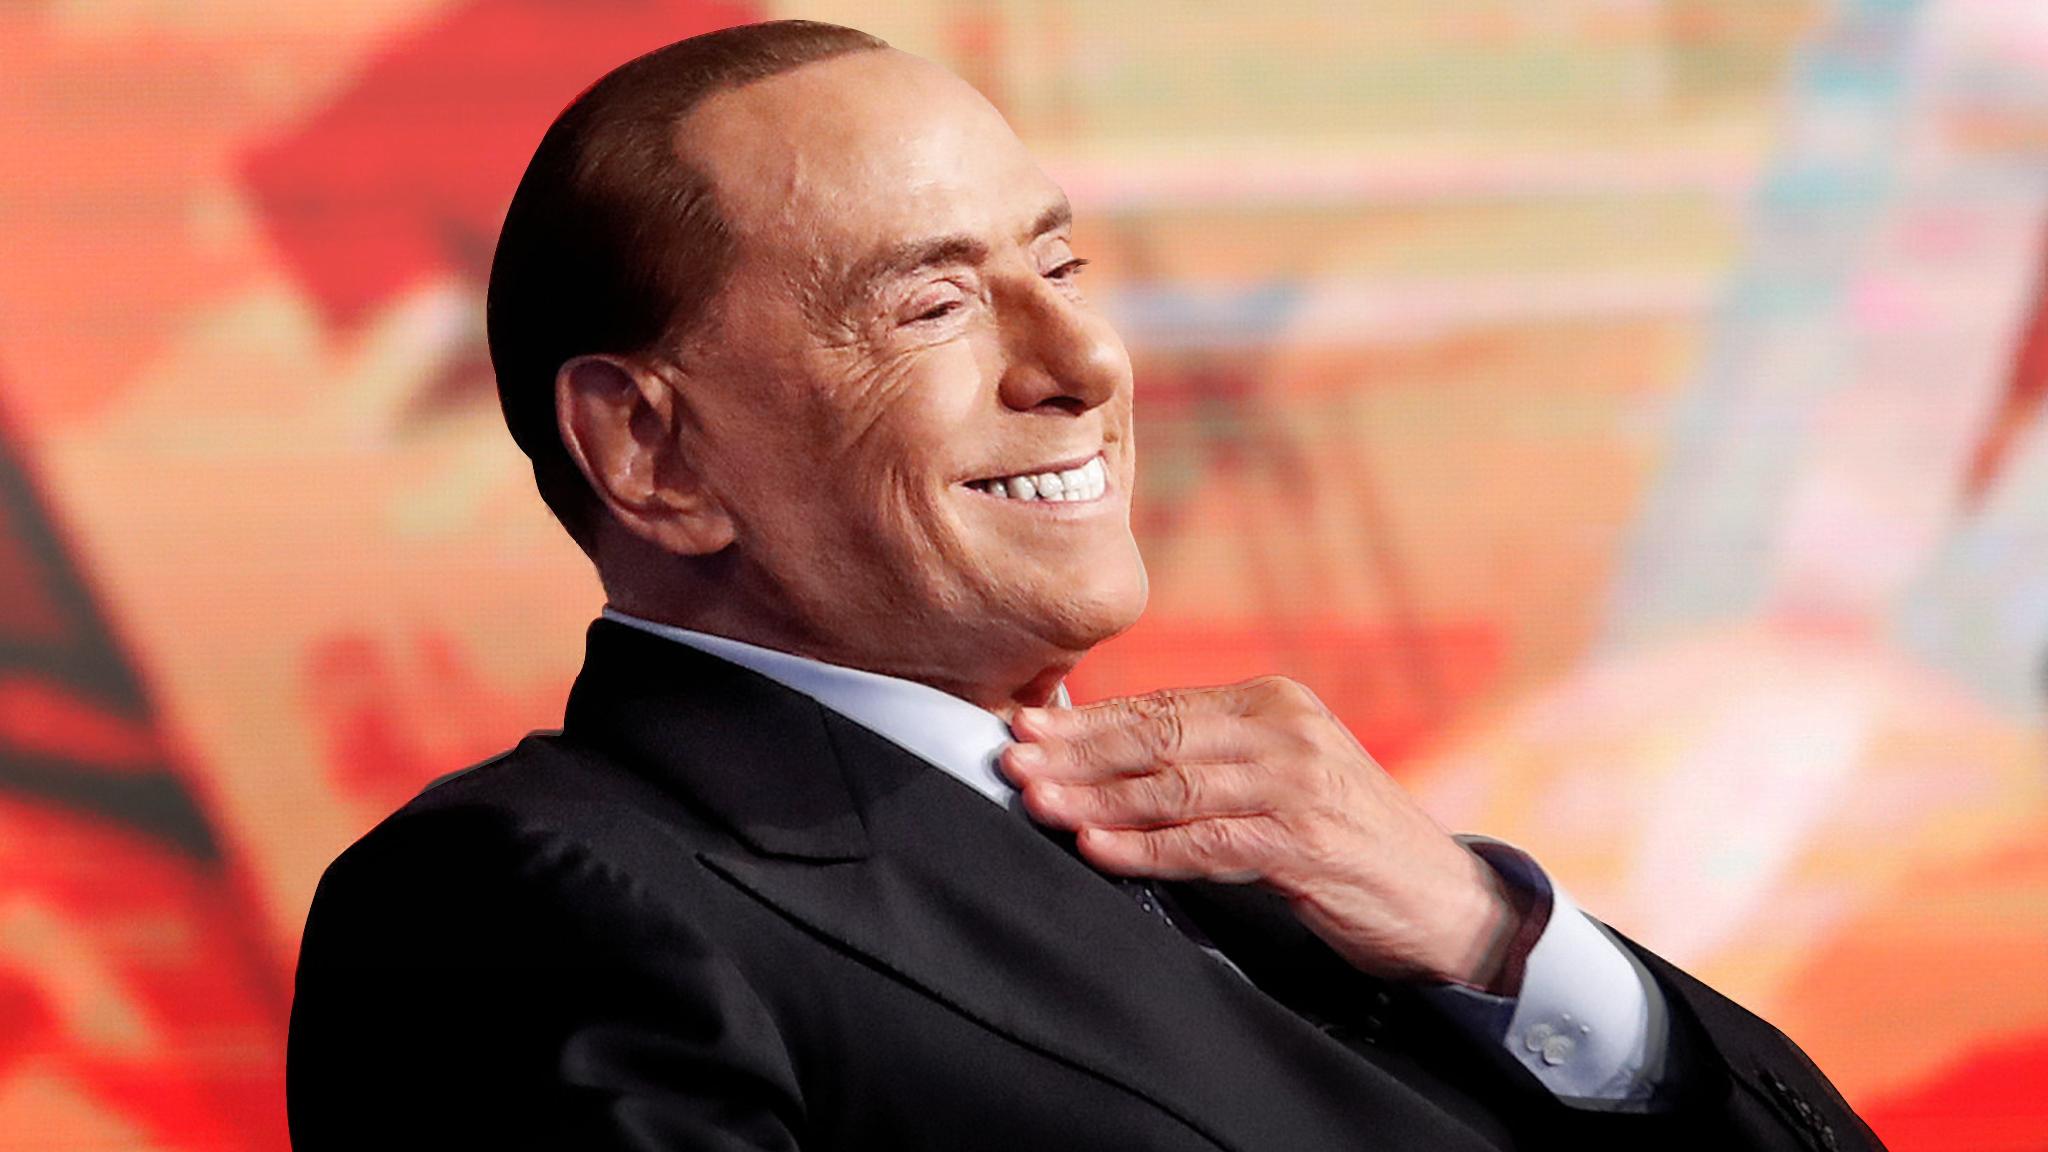 Italian election: the resurrection of 'Saint' Silvio Berlusconi